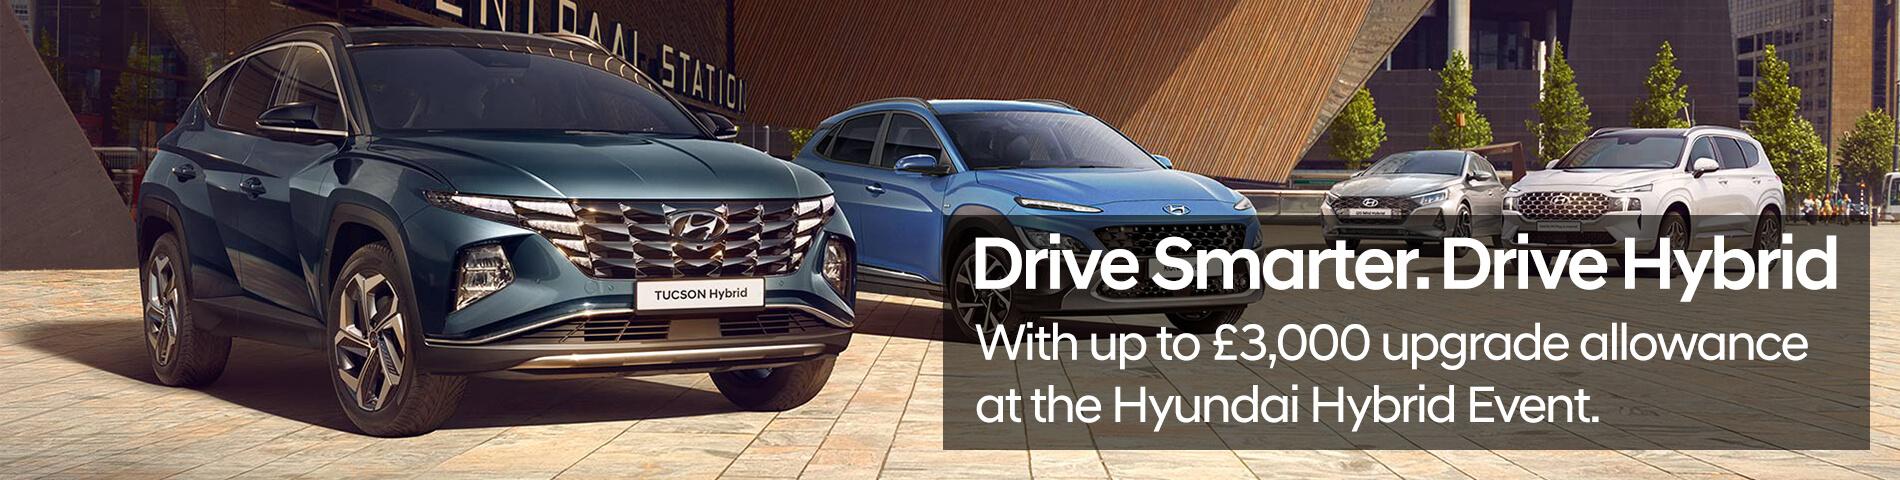 Hyundai Hybrid Event